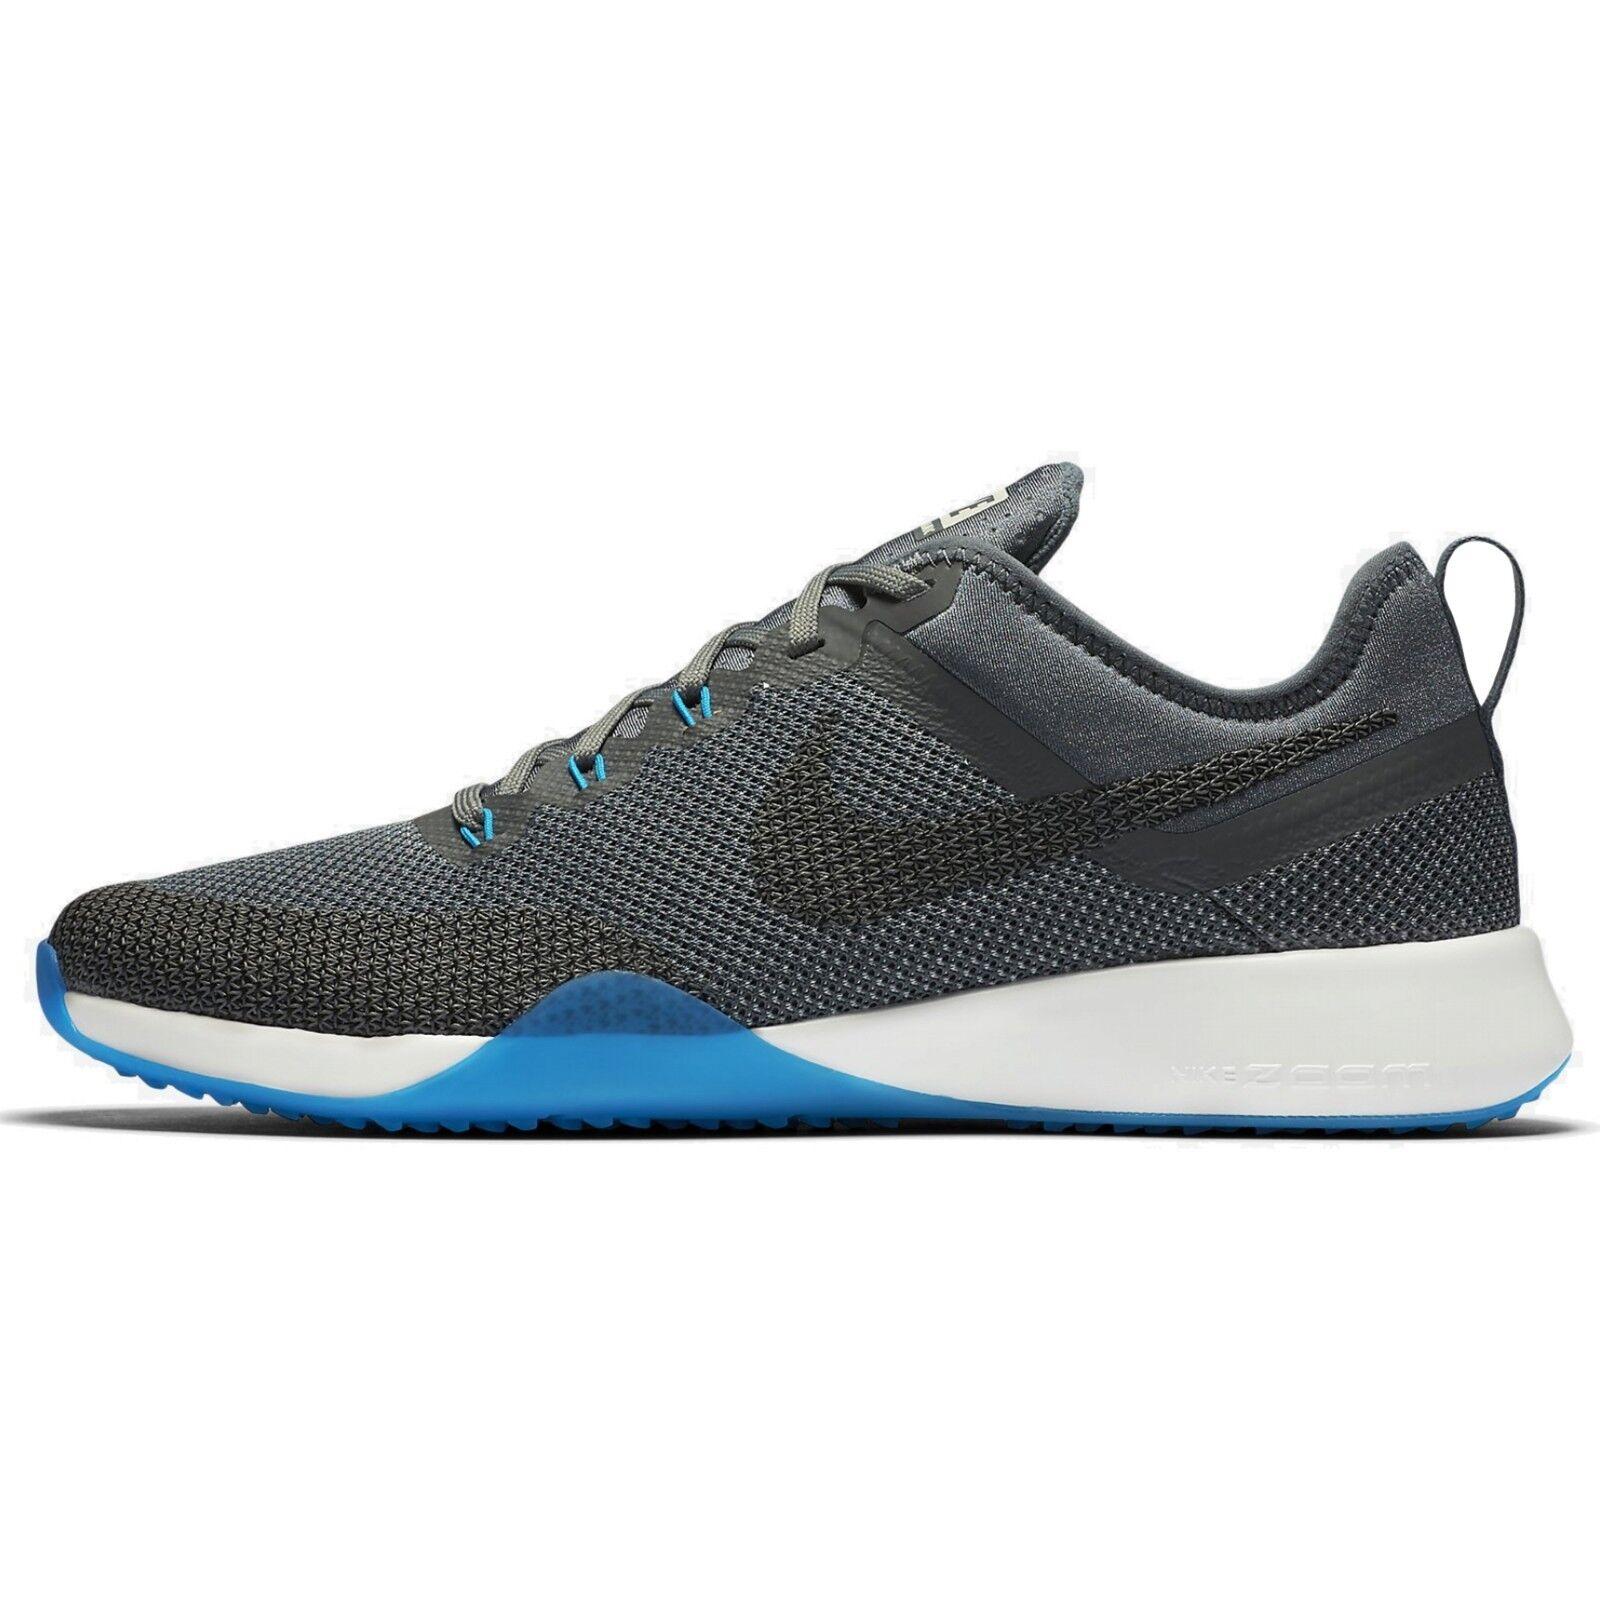 Nuovo  Donna Nike Air Zoom Tr Dinamico   Nuovo Sportive 849803 002 989bad